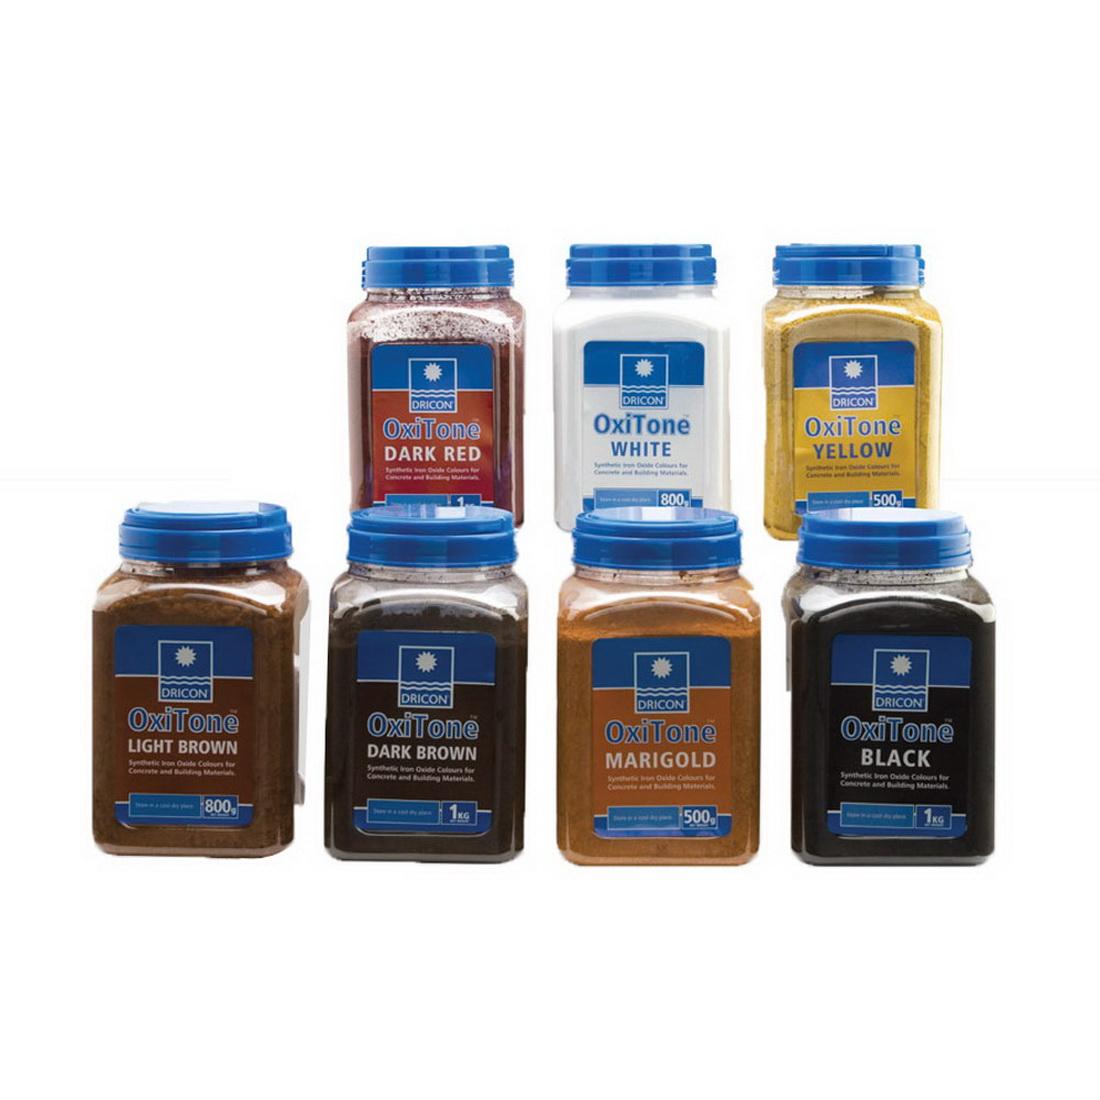 Oxitone Oxide Marigold 500g